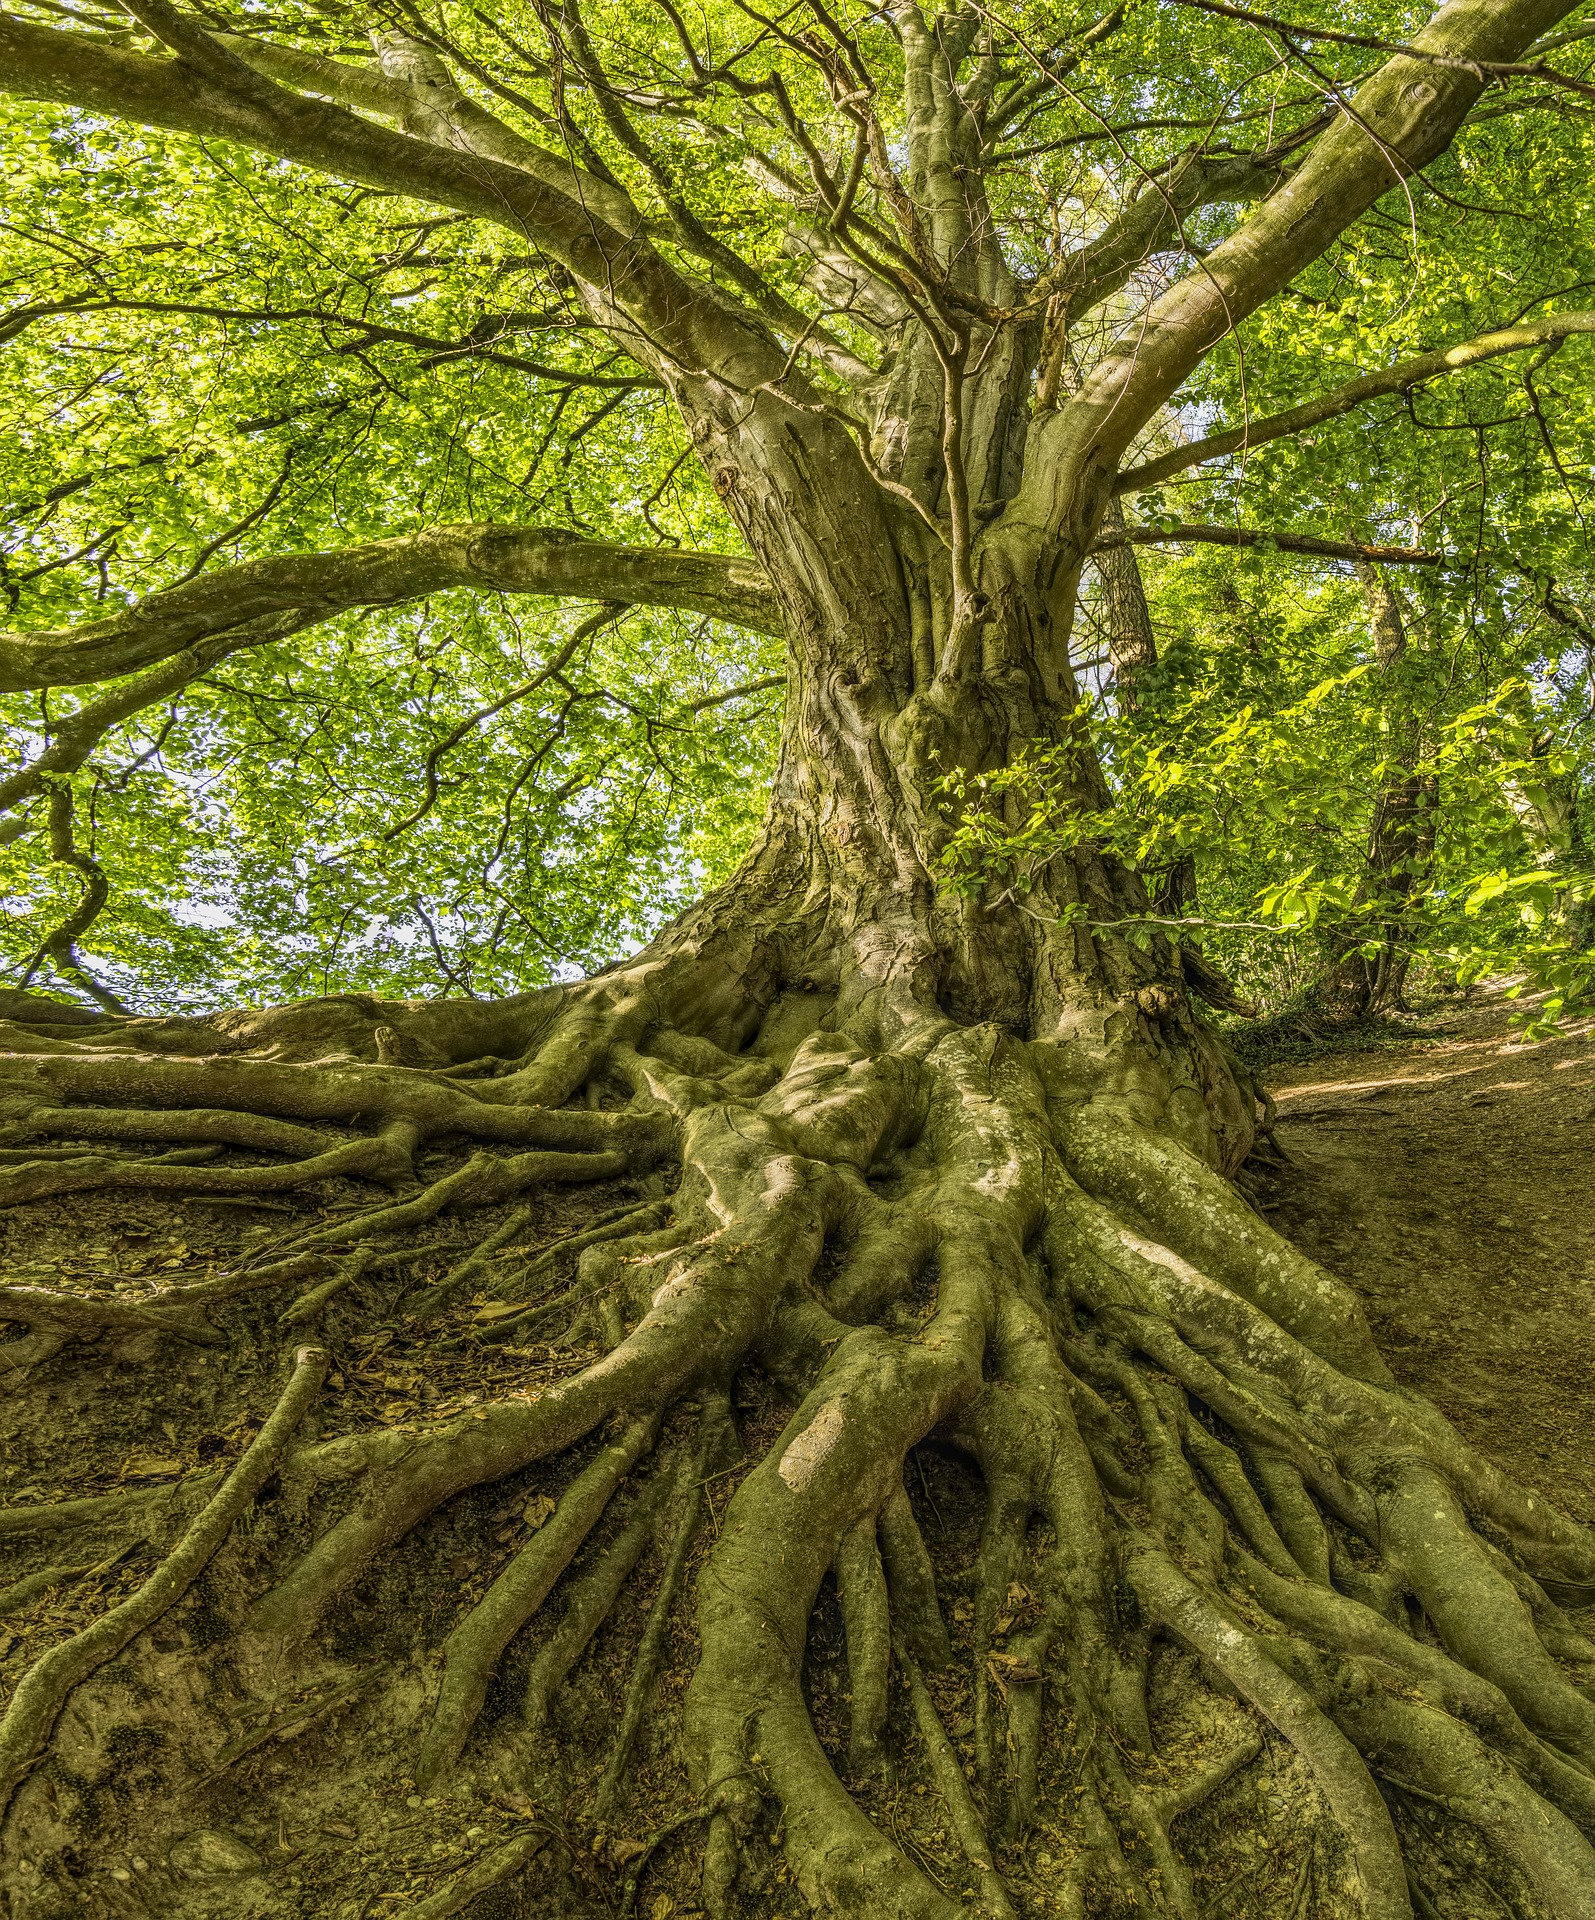 tree-3385957_1920.jpg